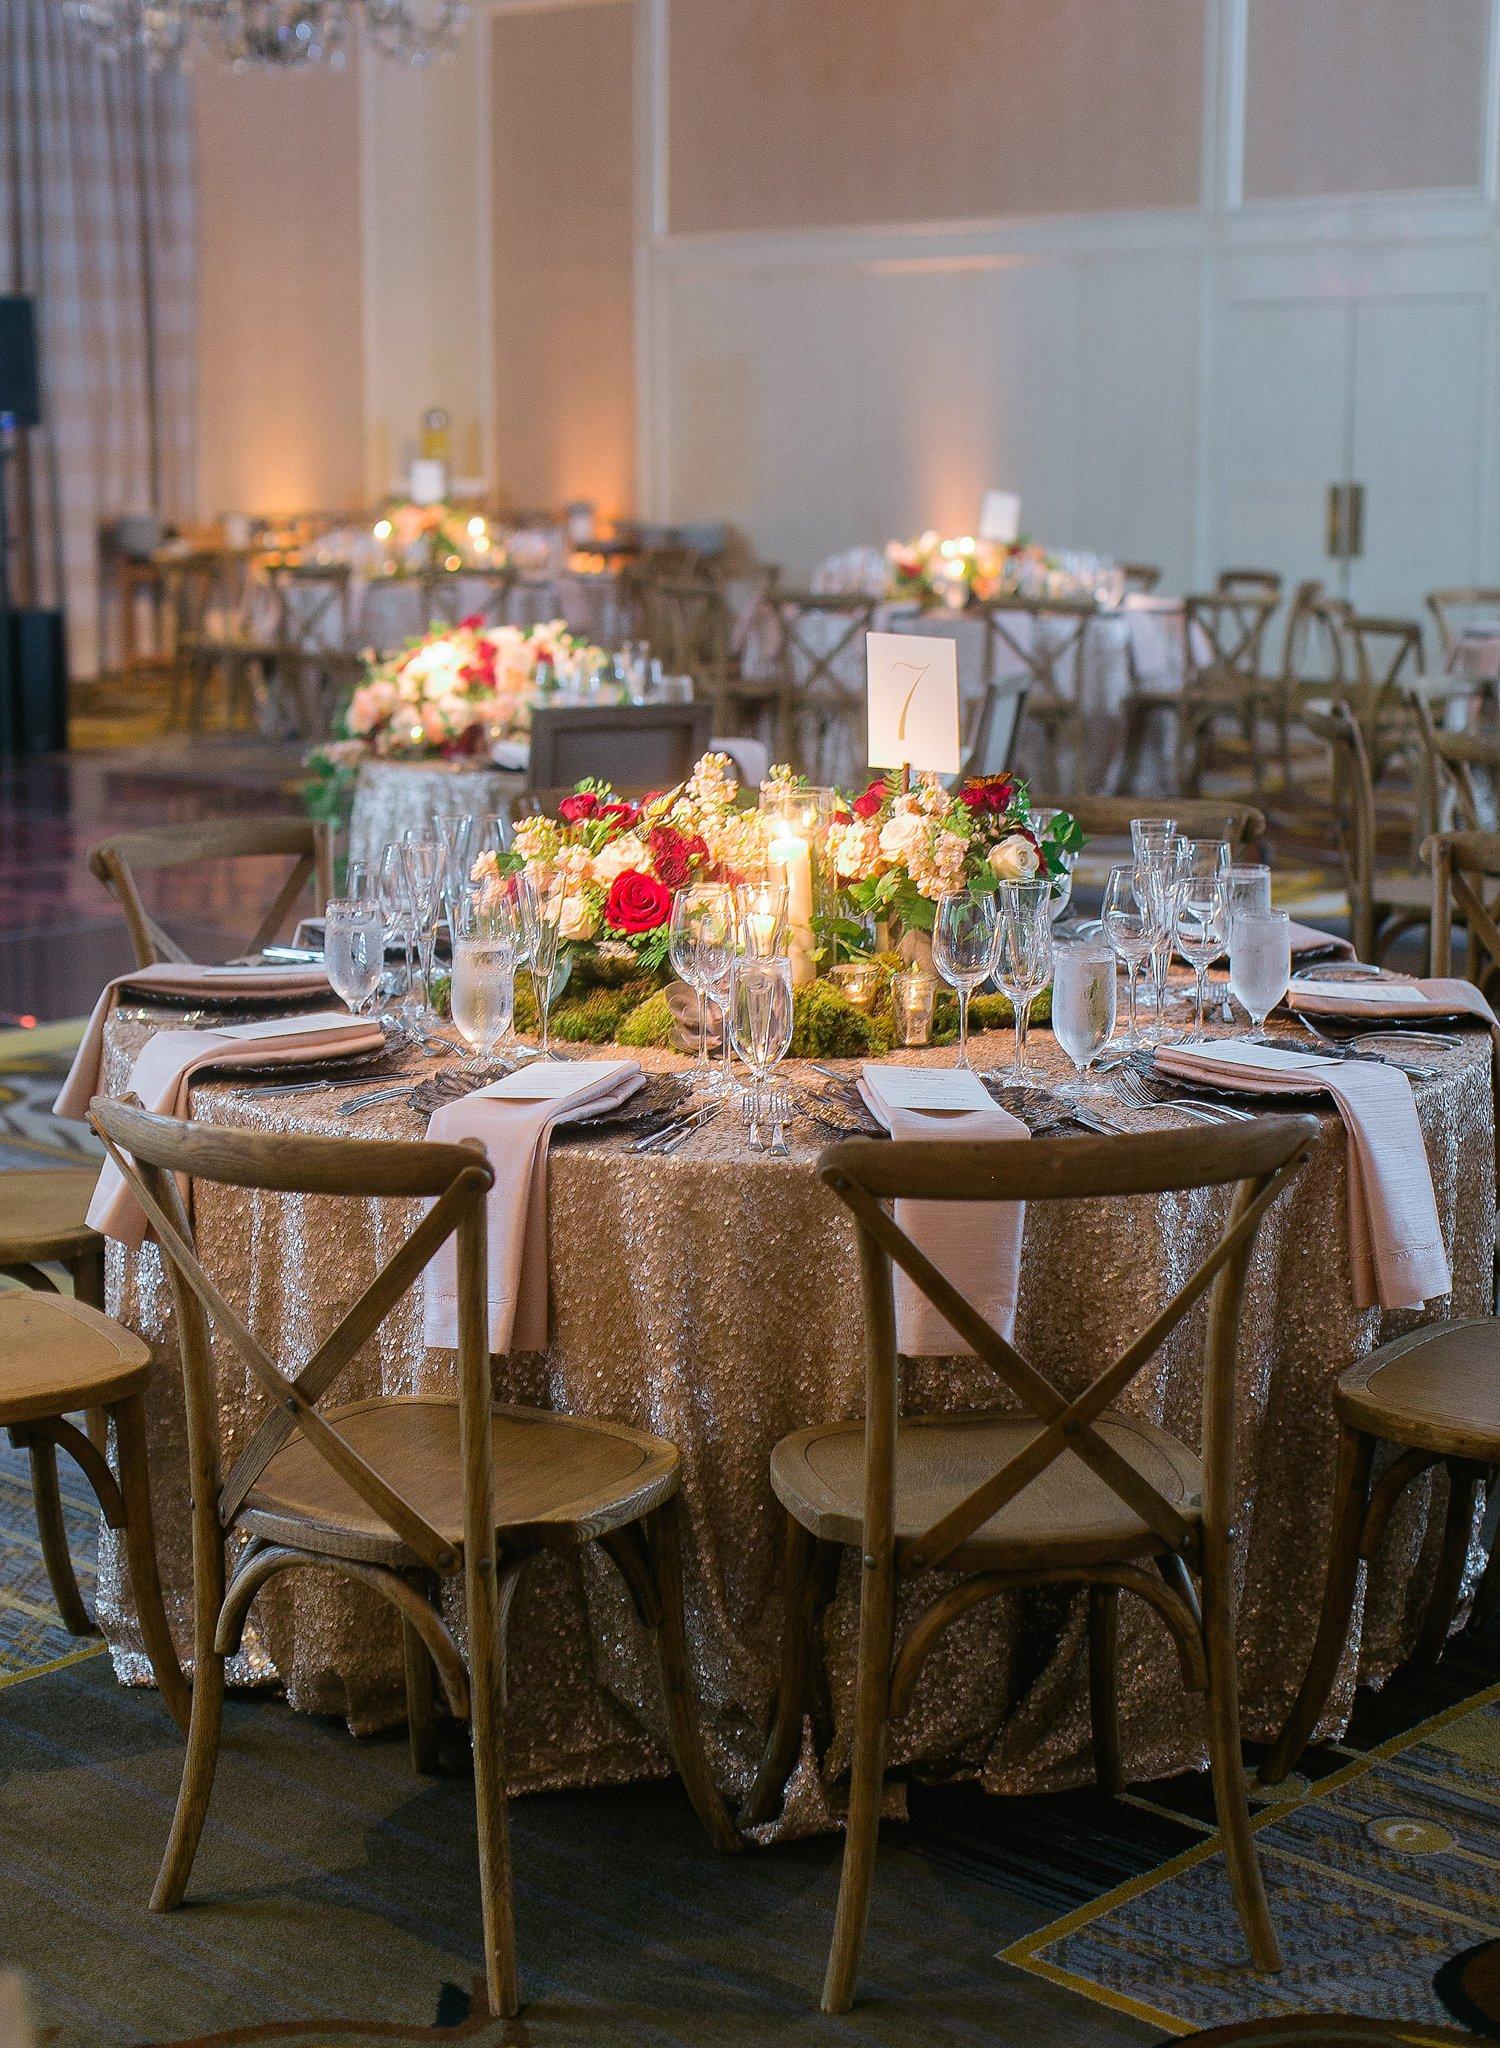 equestrian_classic_wedding_planner_southern_designer.JPG